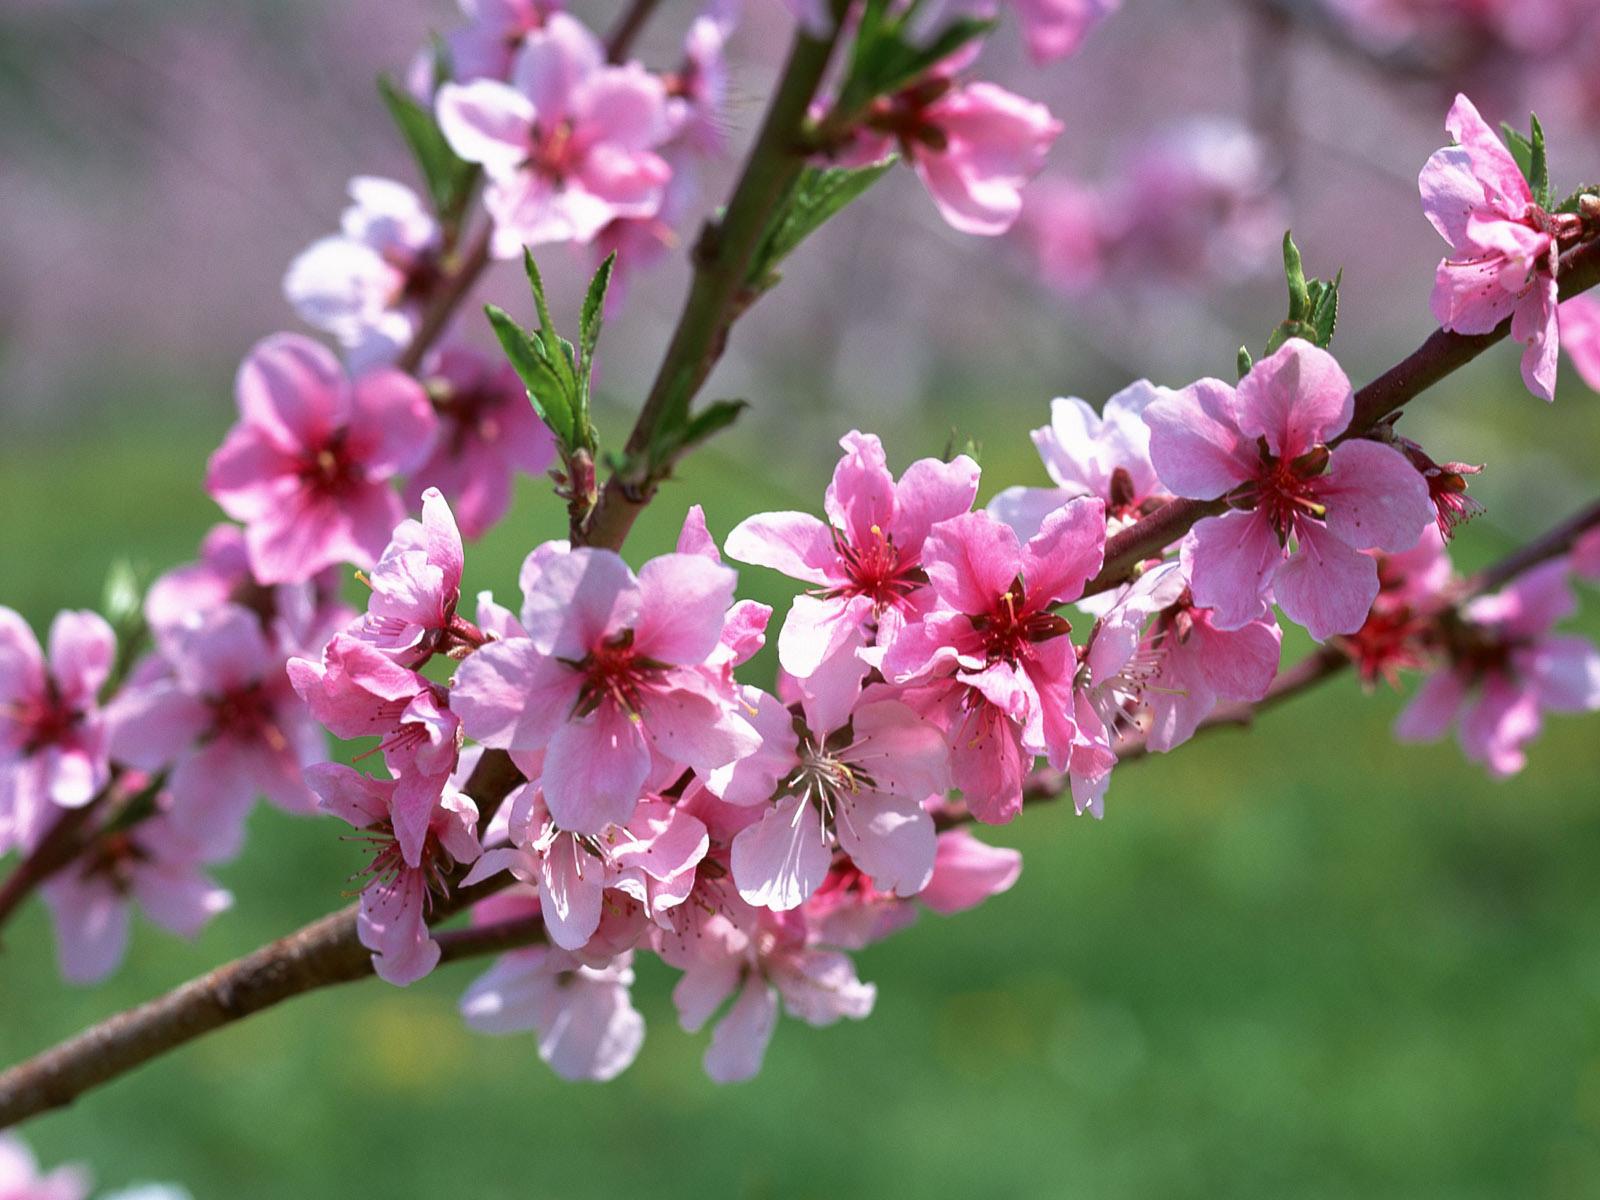 Весна пришла 1600 x 1200